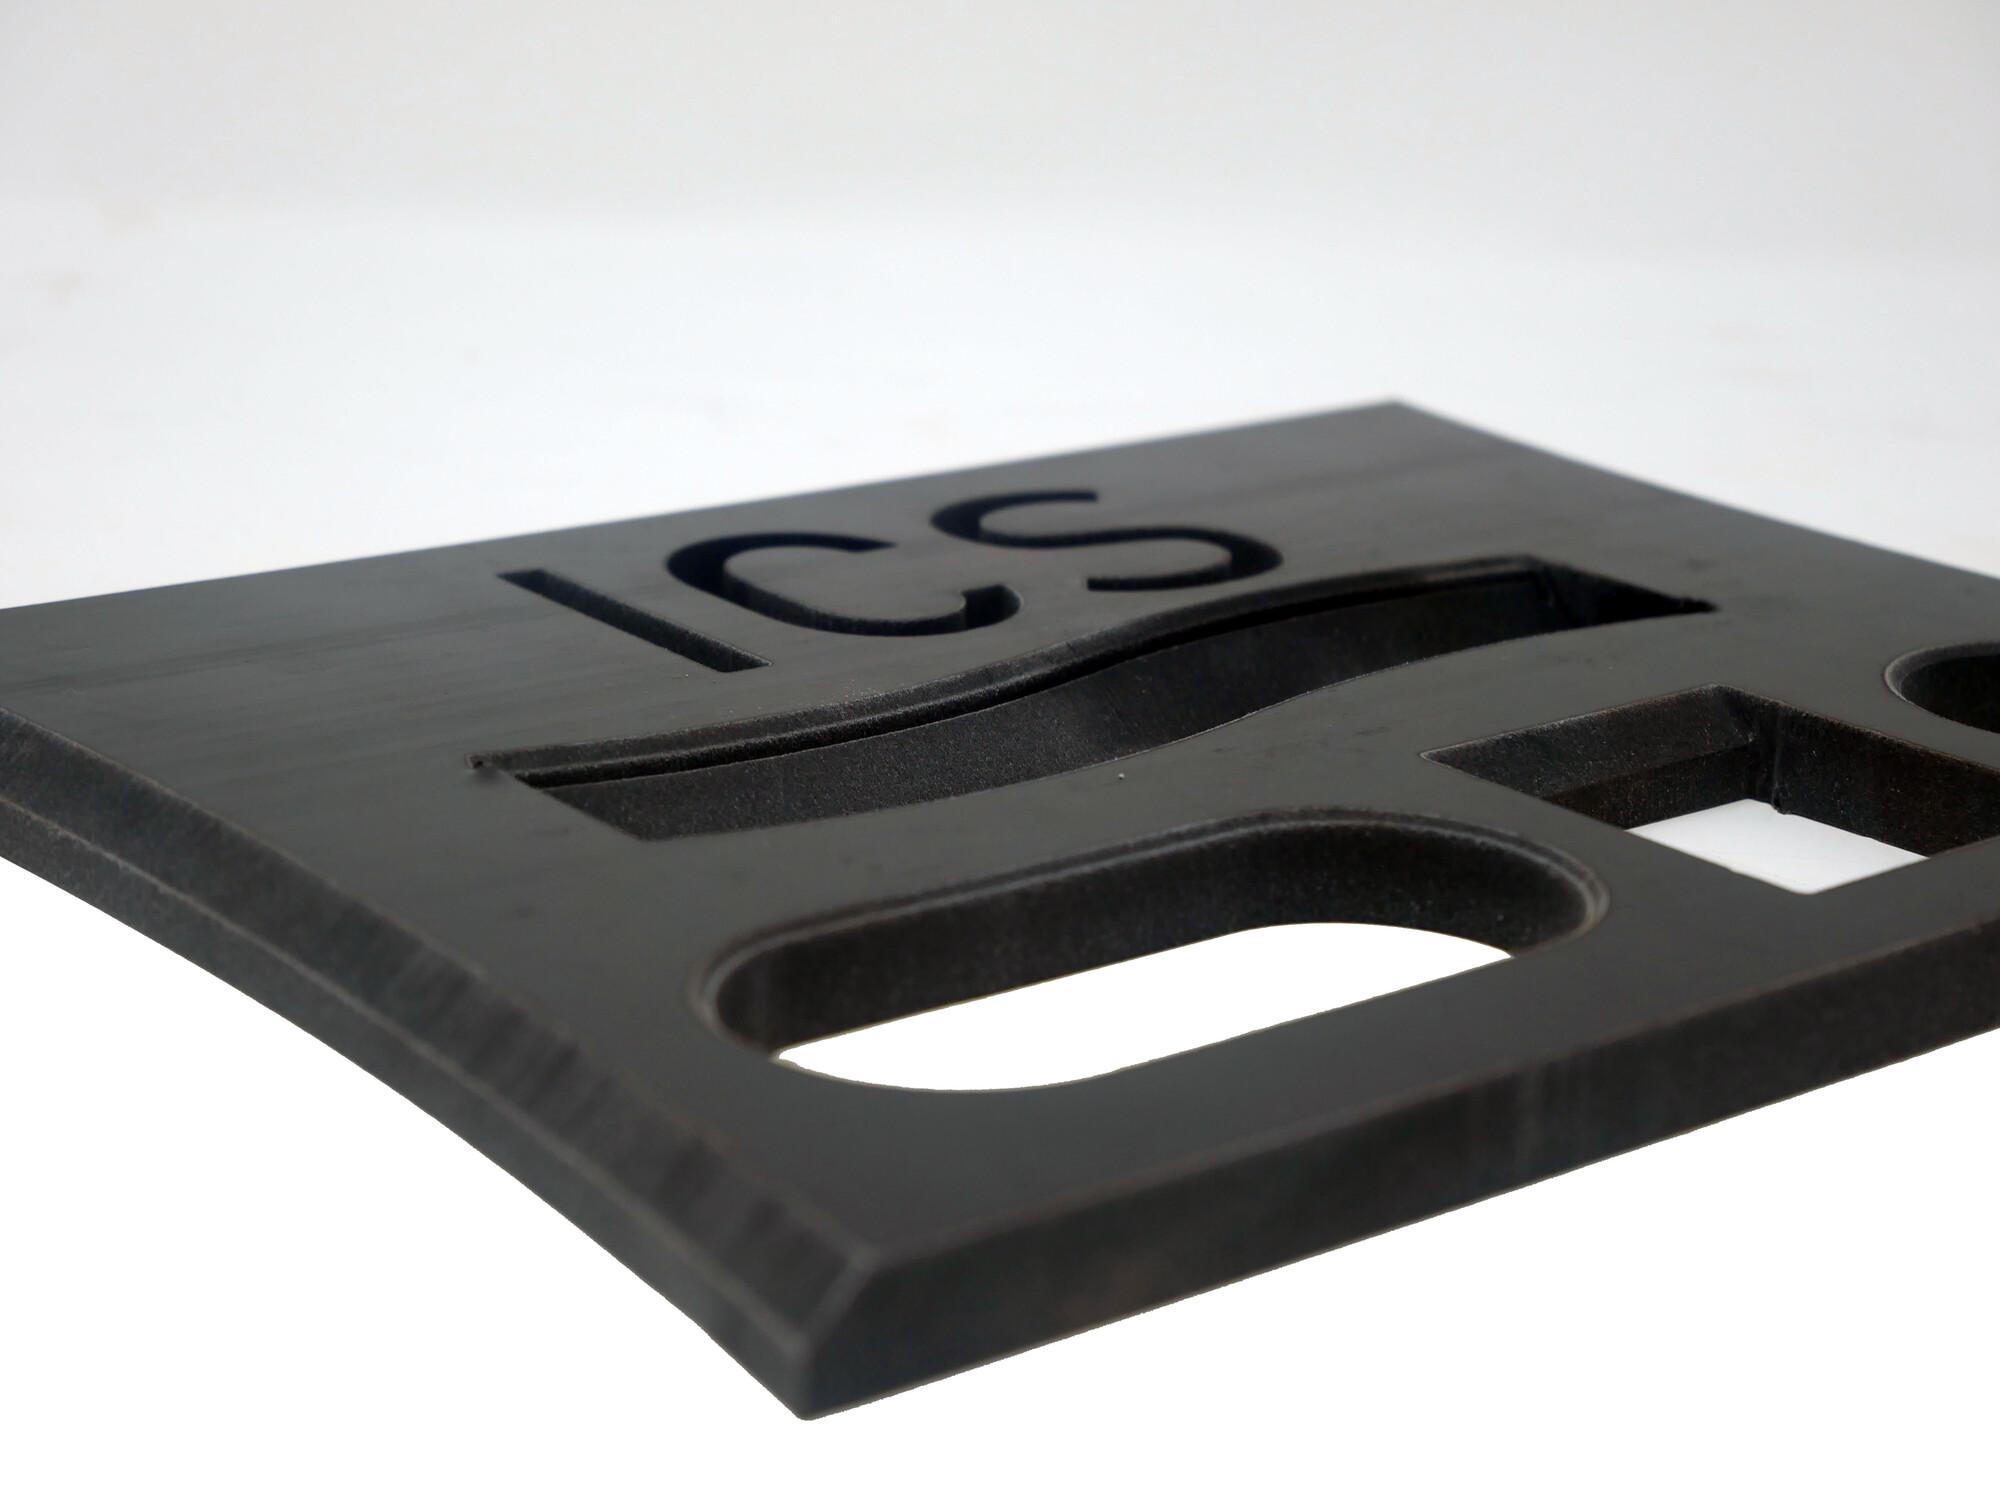 ICS Custom 5-axis waterjet cutting